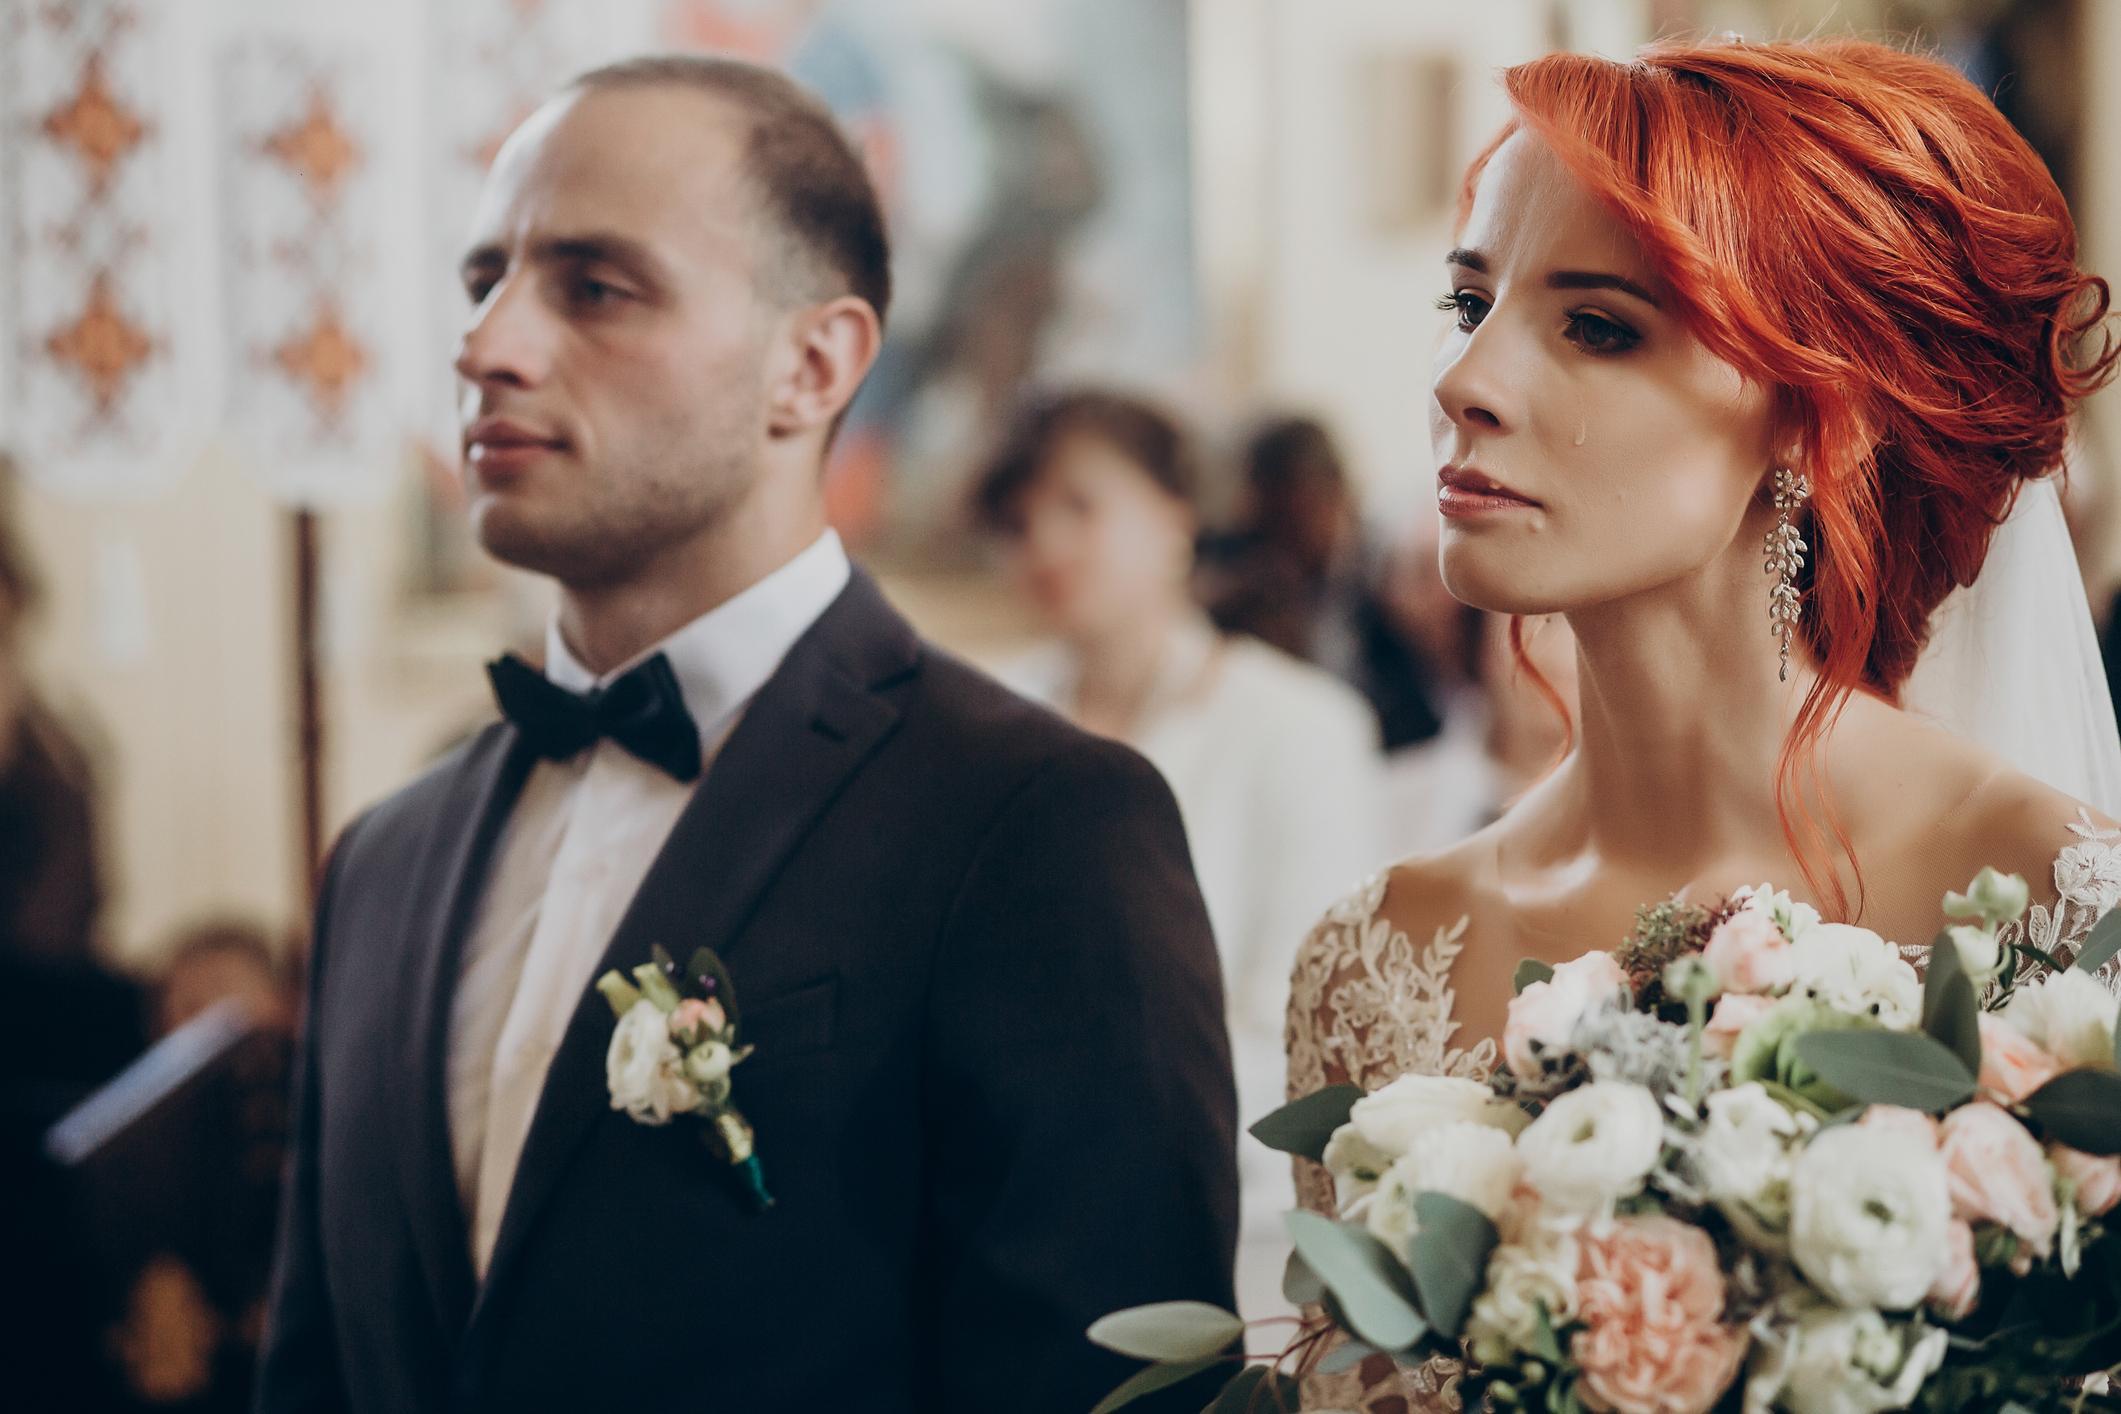 4-wedding-red-flag-silent-groom-1556122510139.jpg